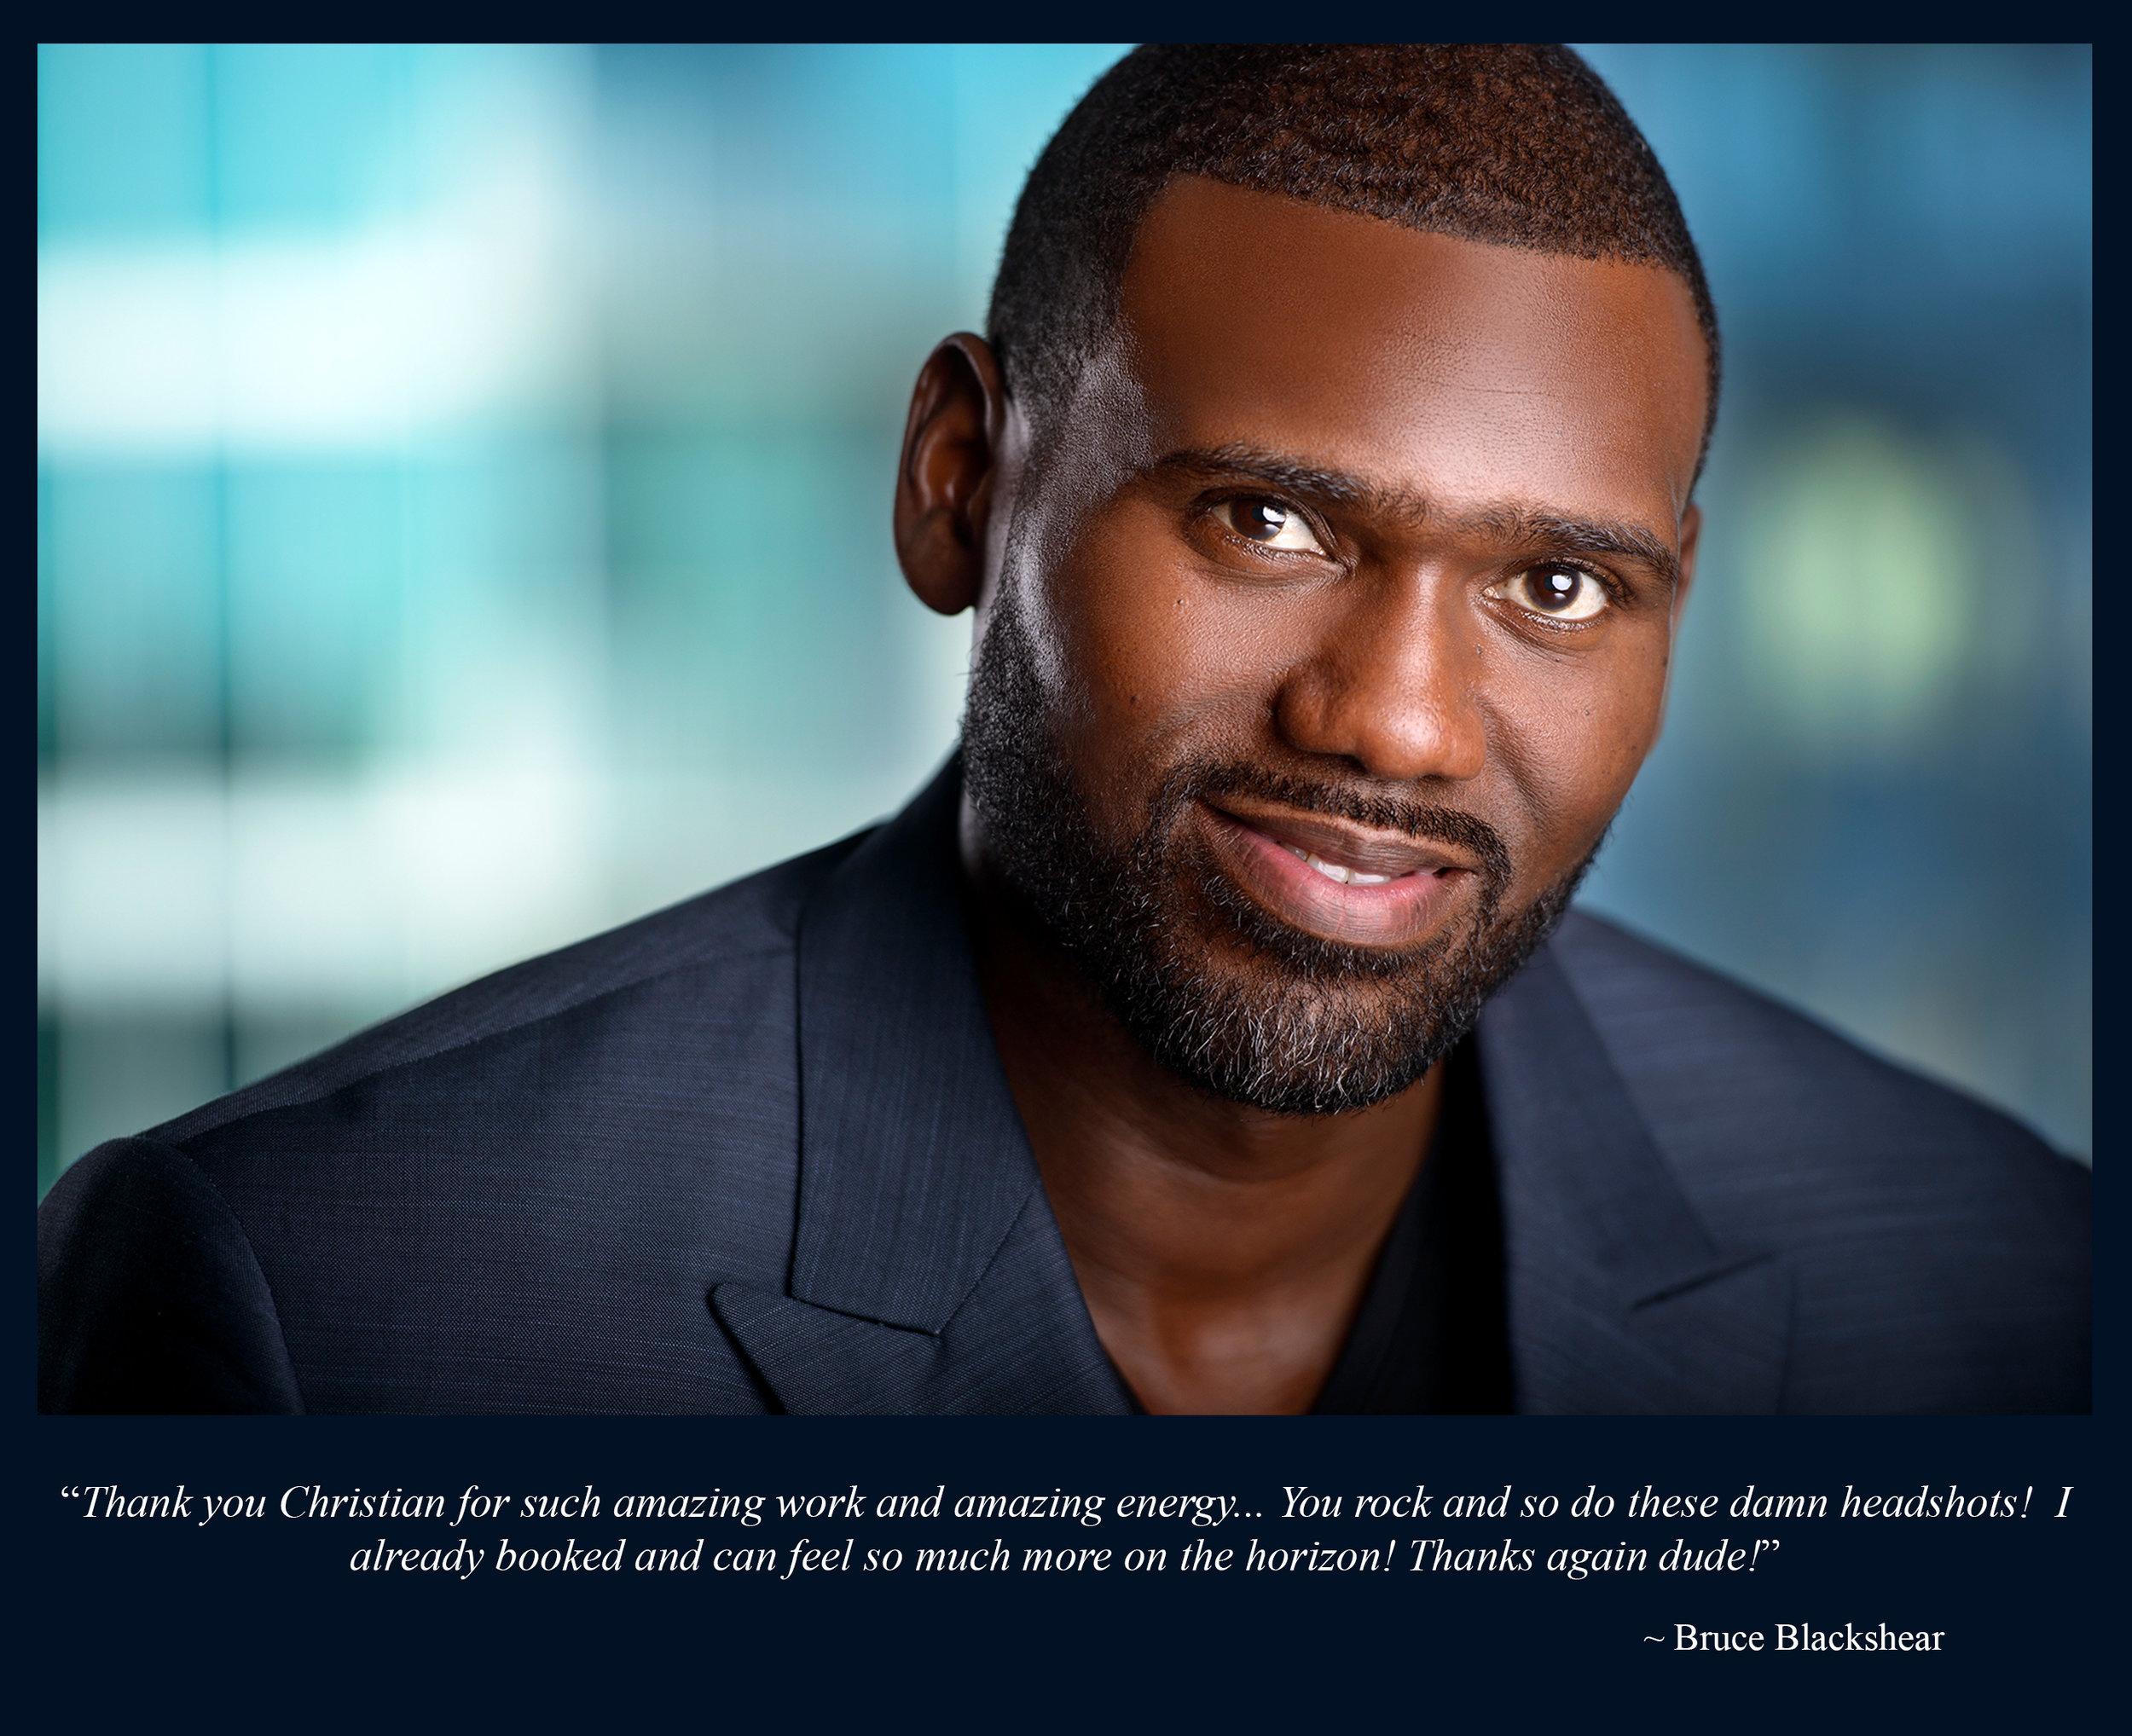 Christian Webb-Actor-Headshots-Atlanta-Actors-Bruce Blackshear-Review.jpg